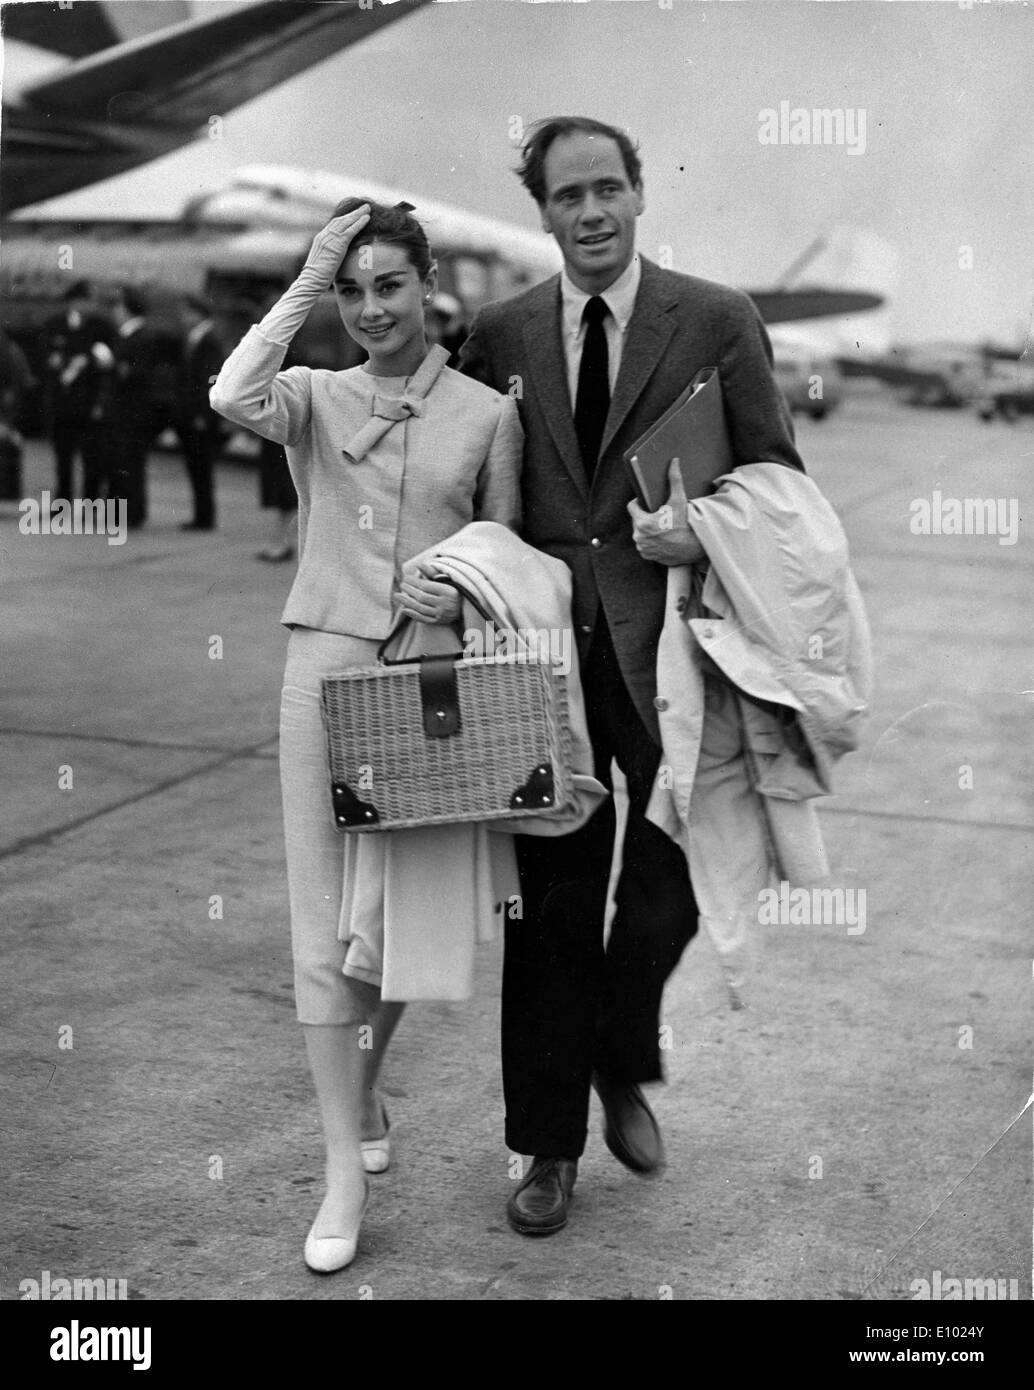 Actors Audrey Hepburn and Mel Ferrer arrive at airport - Stock Image